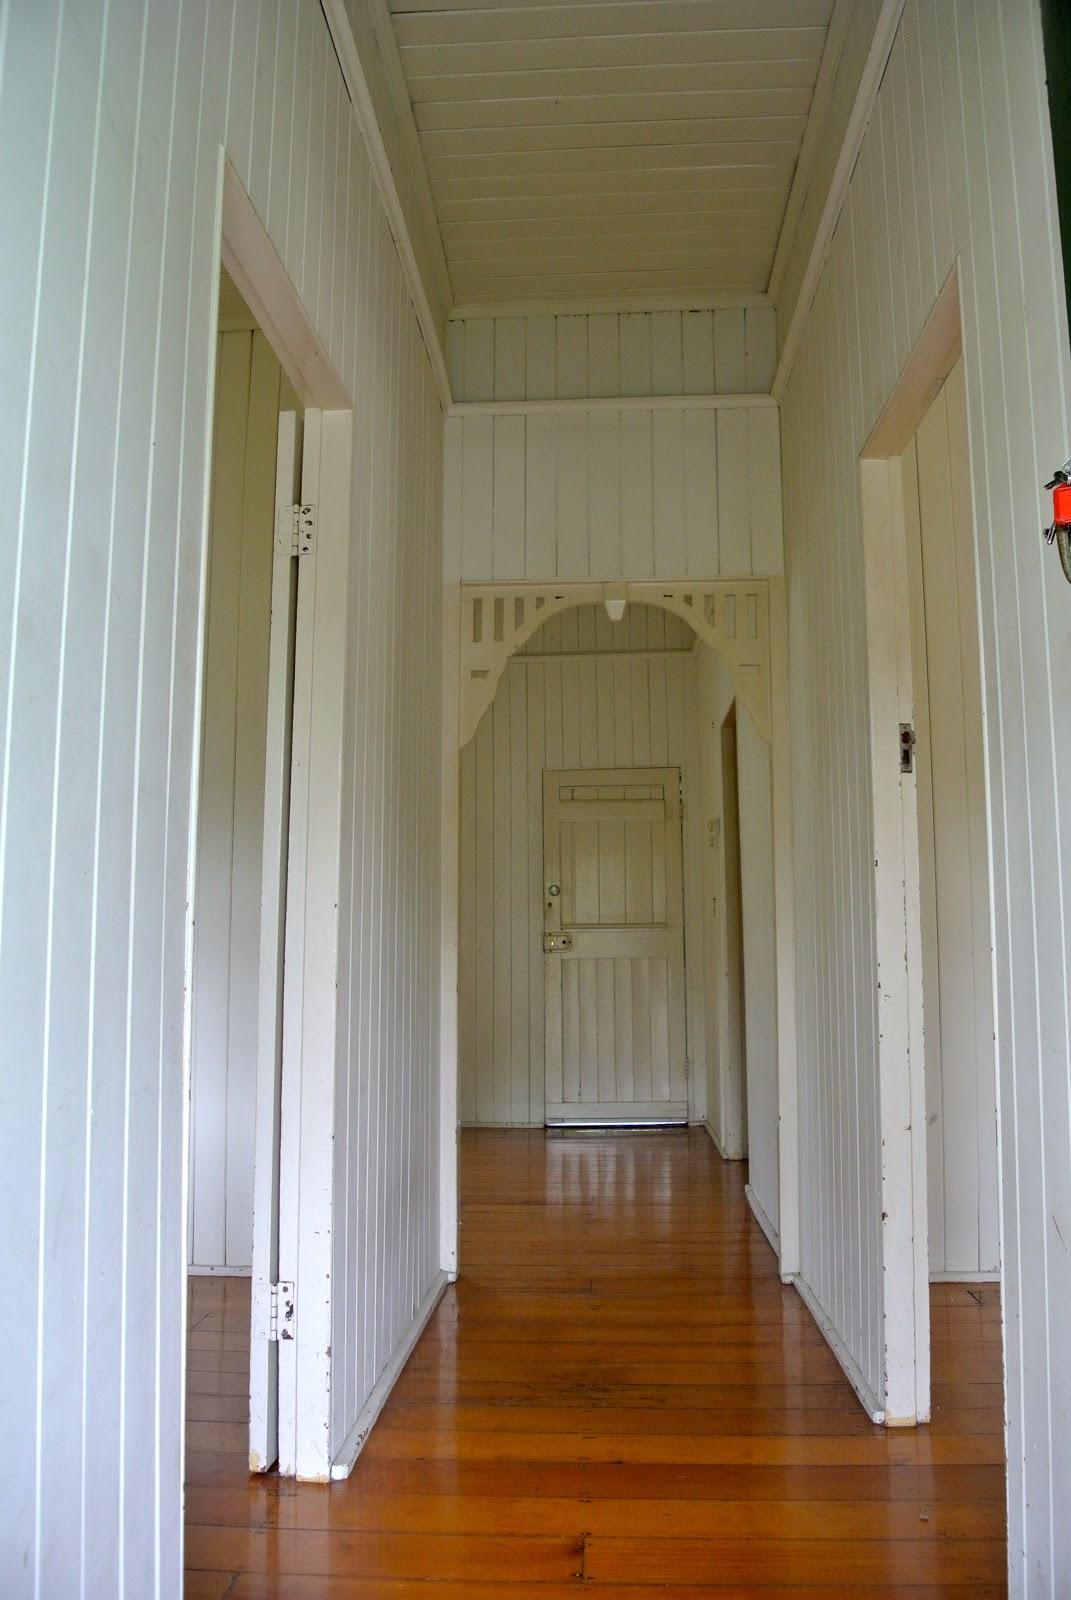 Bathroom designs for queenslander homes home decorating for Queenslander bathroom designs